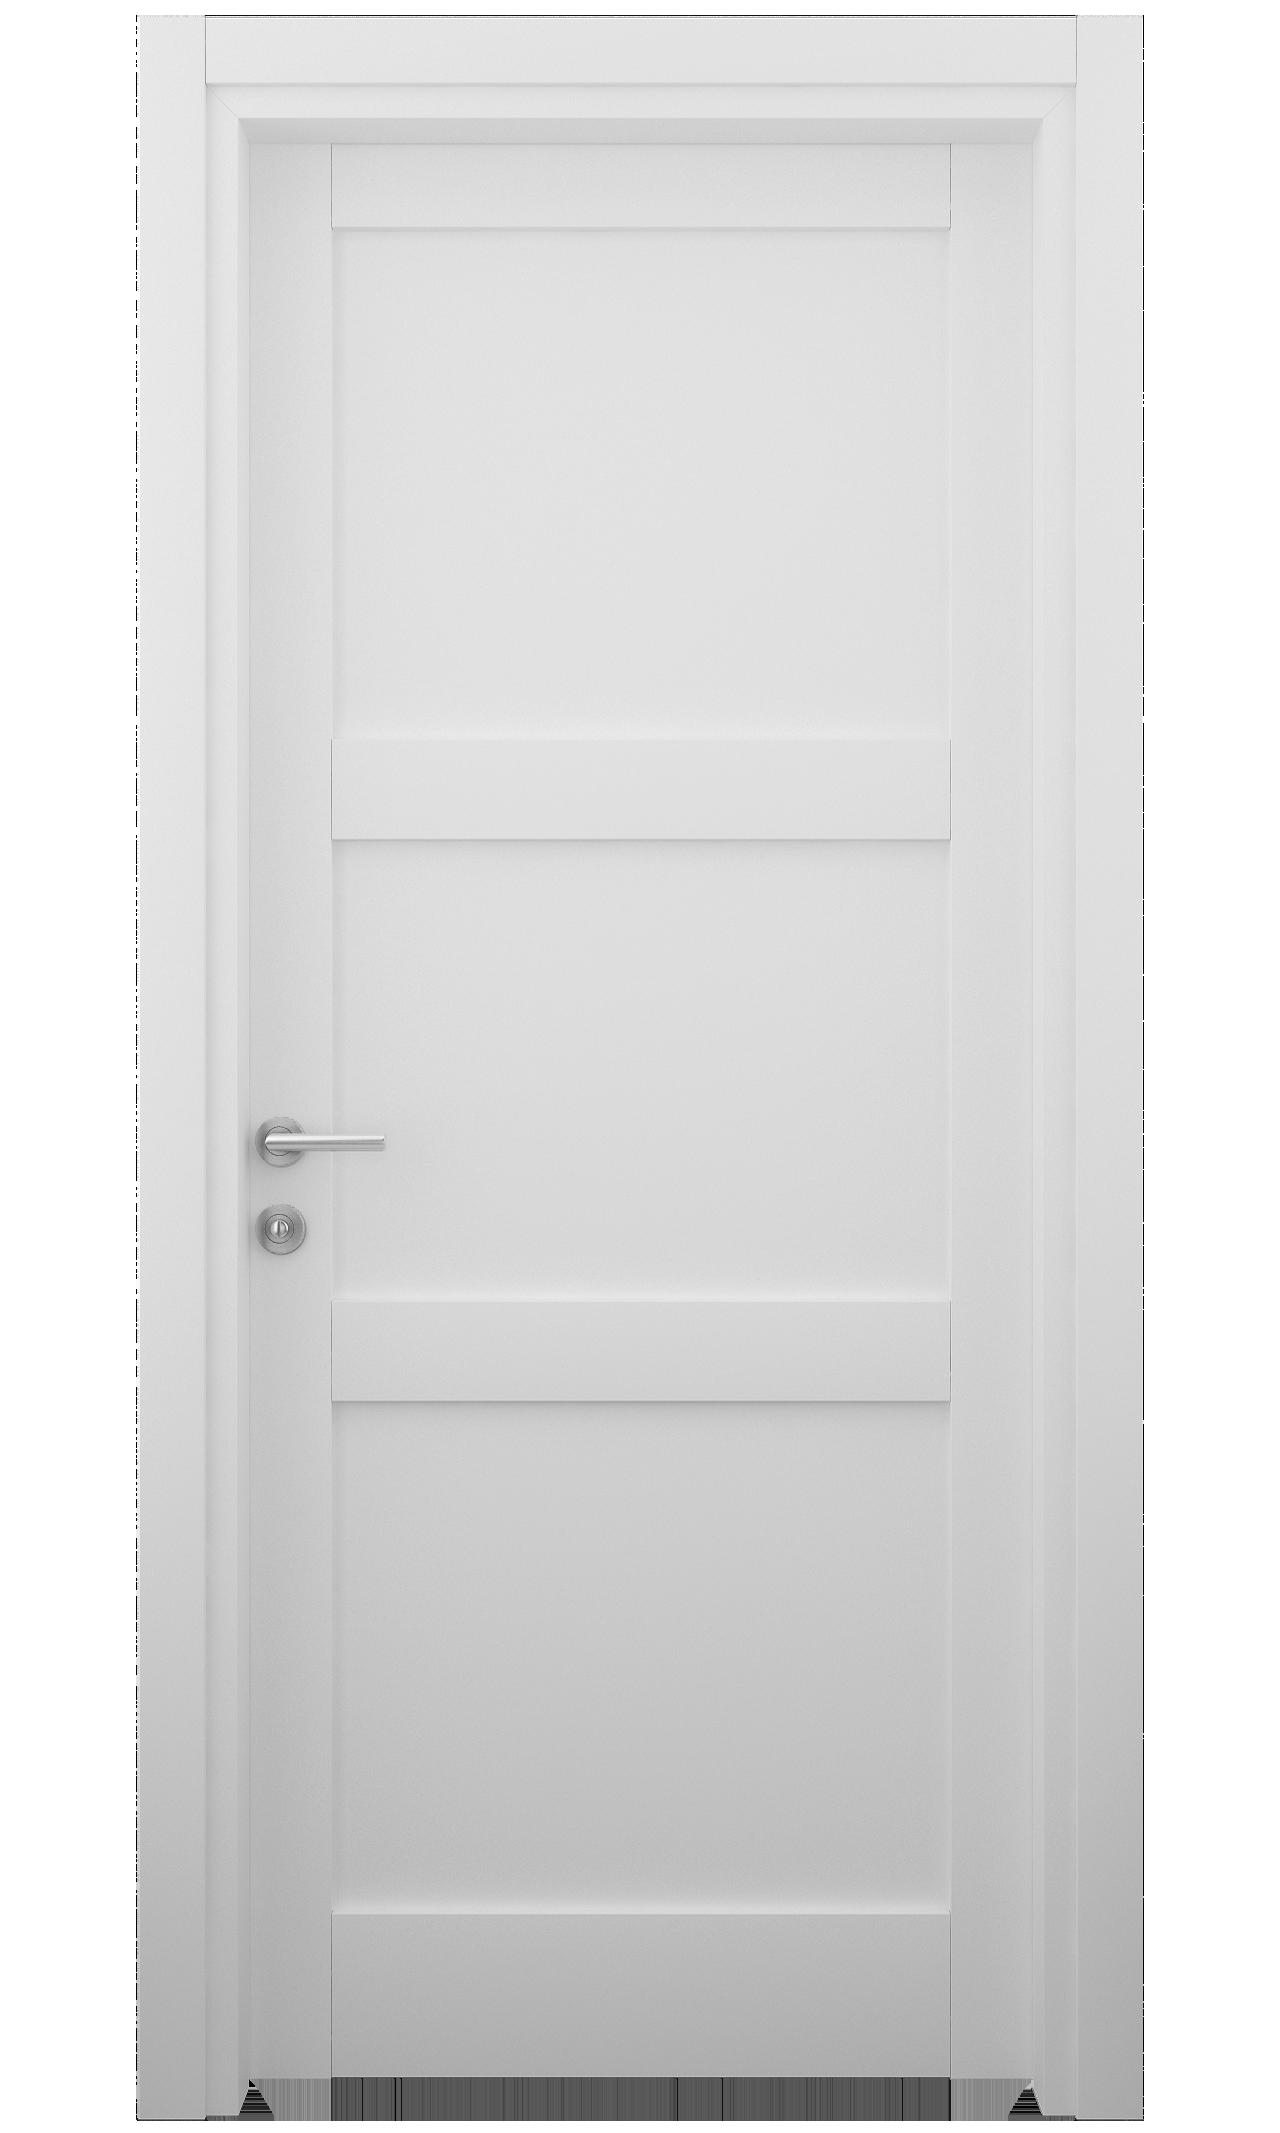 Transitional Swing Door In Matte White Finish Transitional Interior Doors Transitional Doors Internal Doors Modern